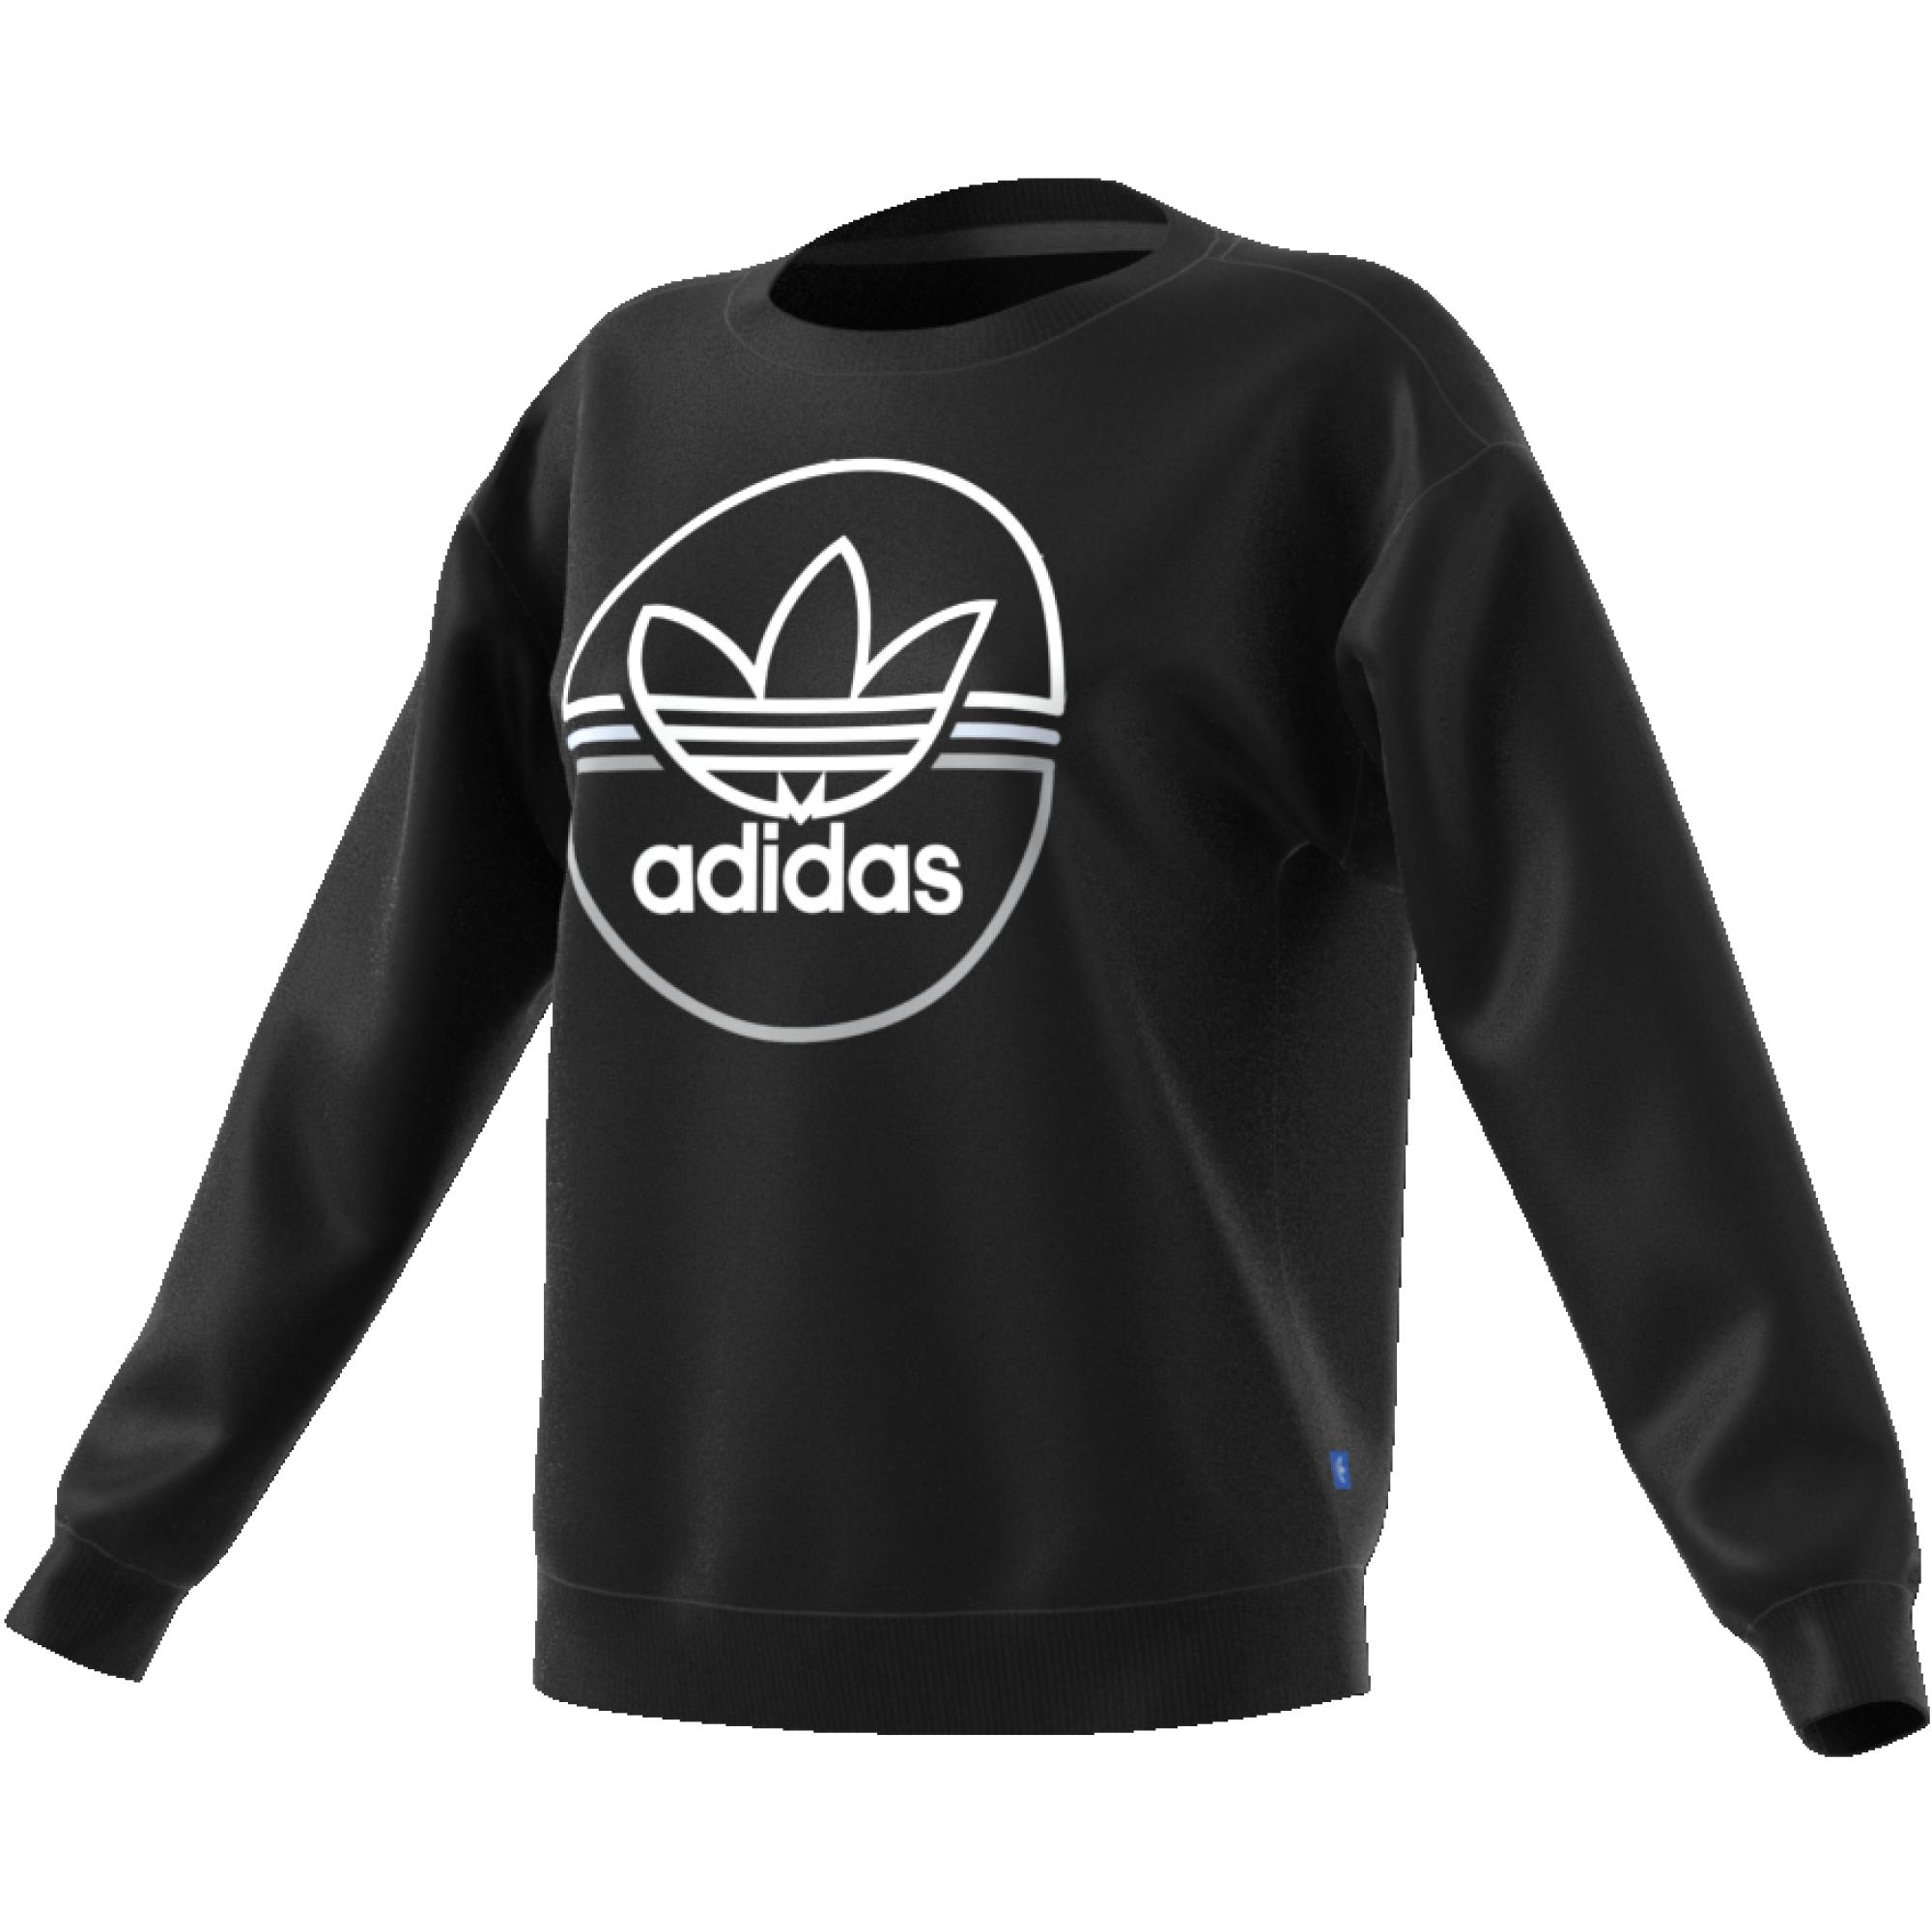 9ee23f4922 Adidas pulóver , Női ruházat   pulóver , adidas_originals , Adidas pulóver